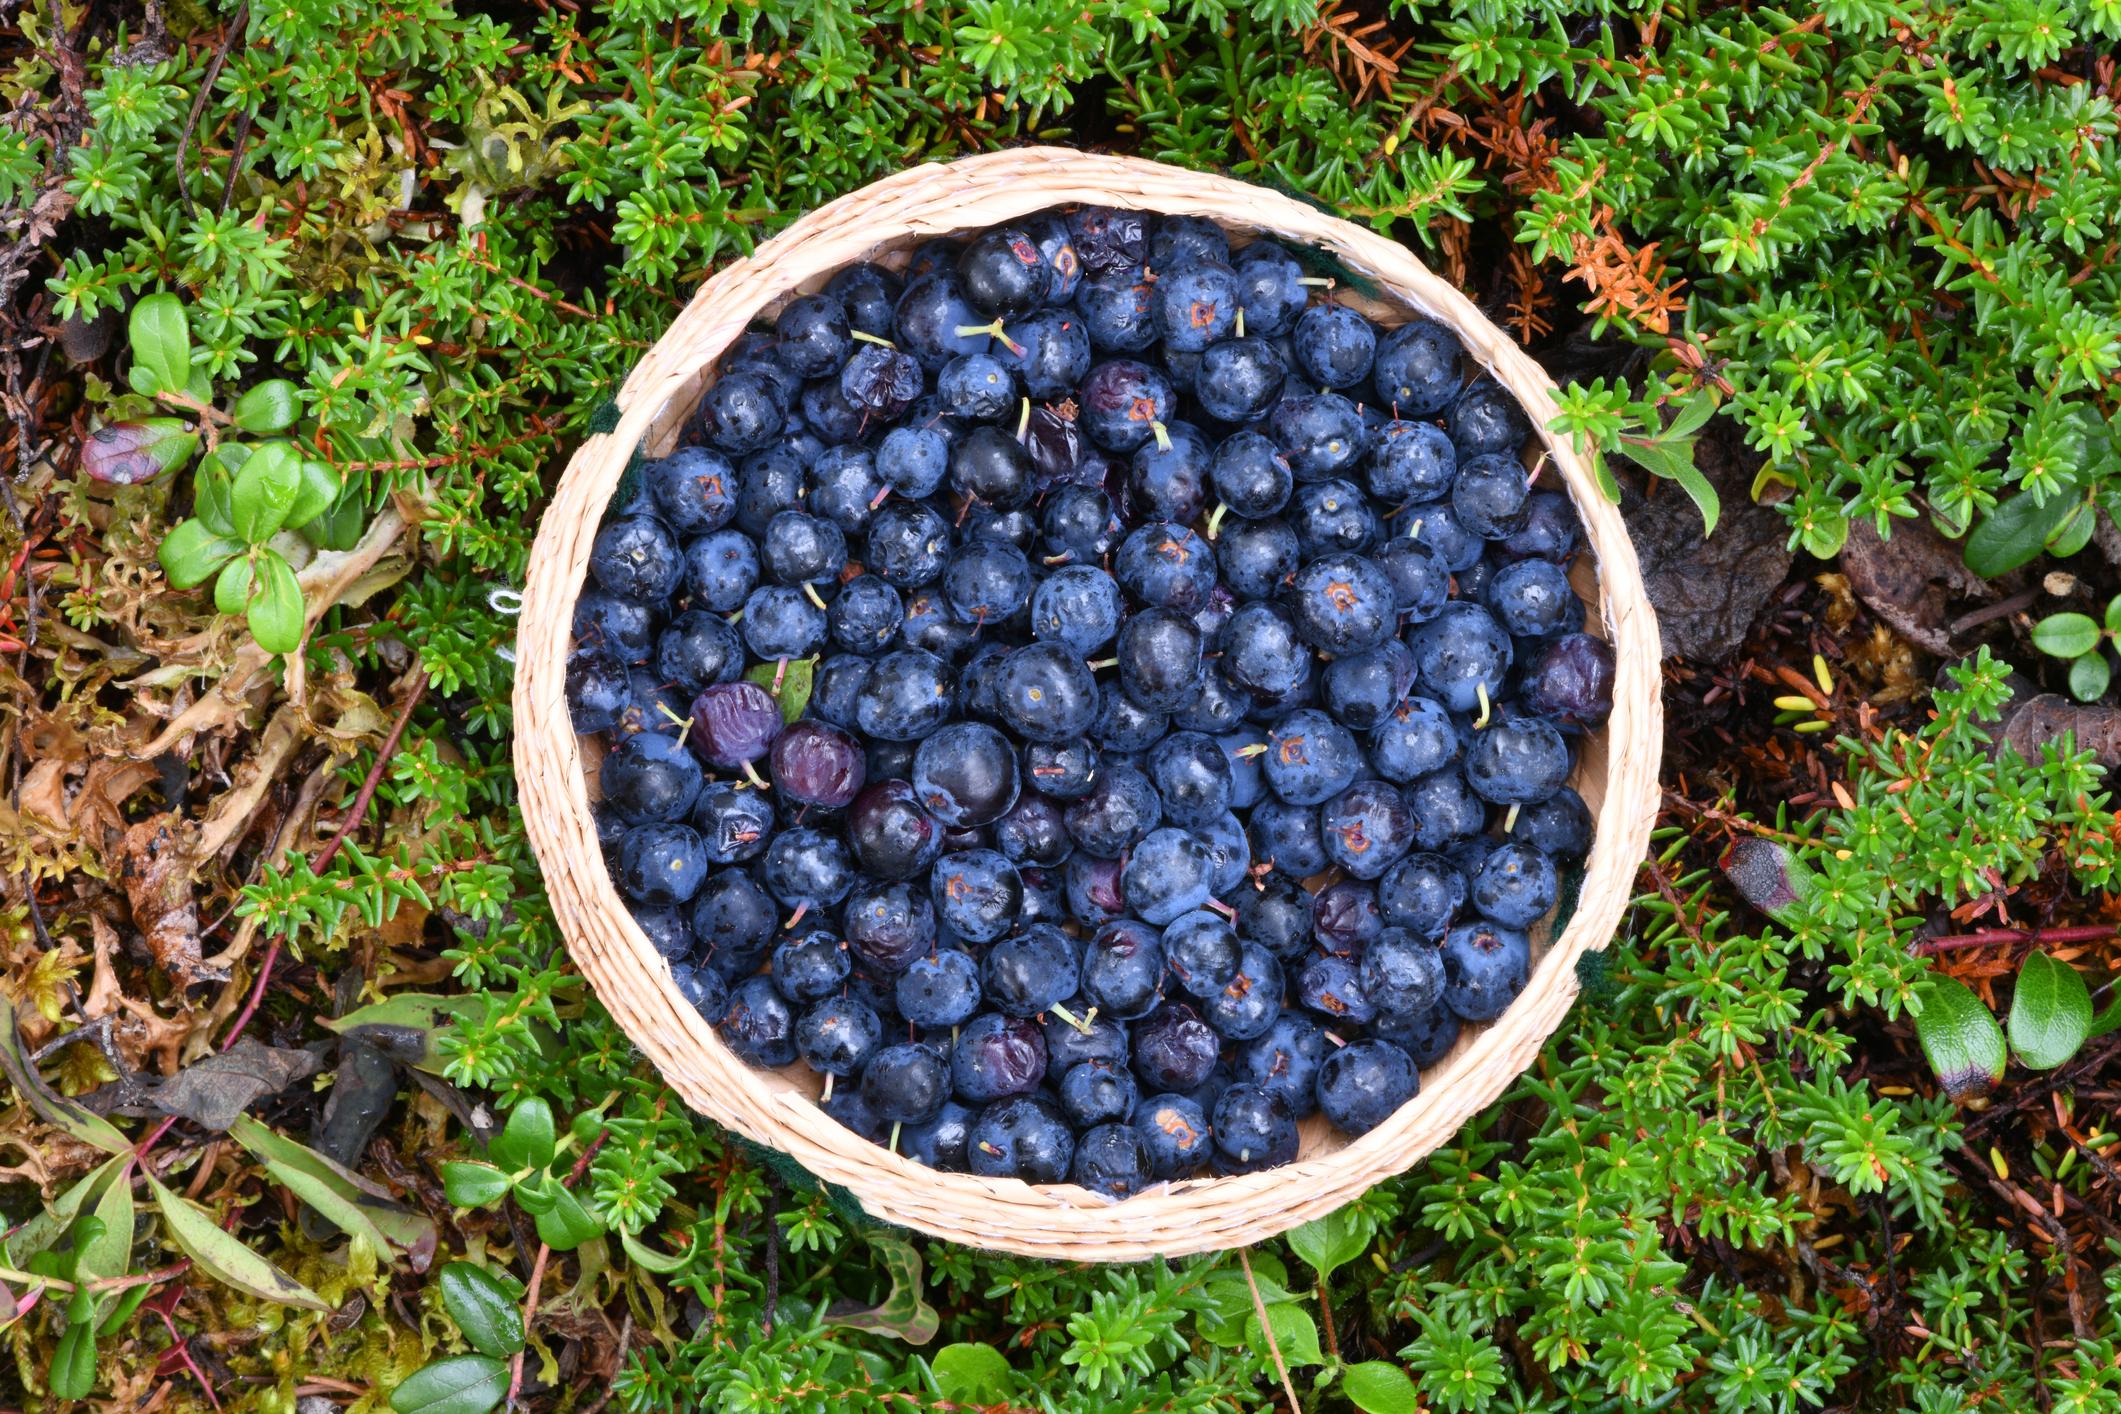 Wild Alaskan blueberries in a basket.